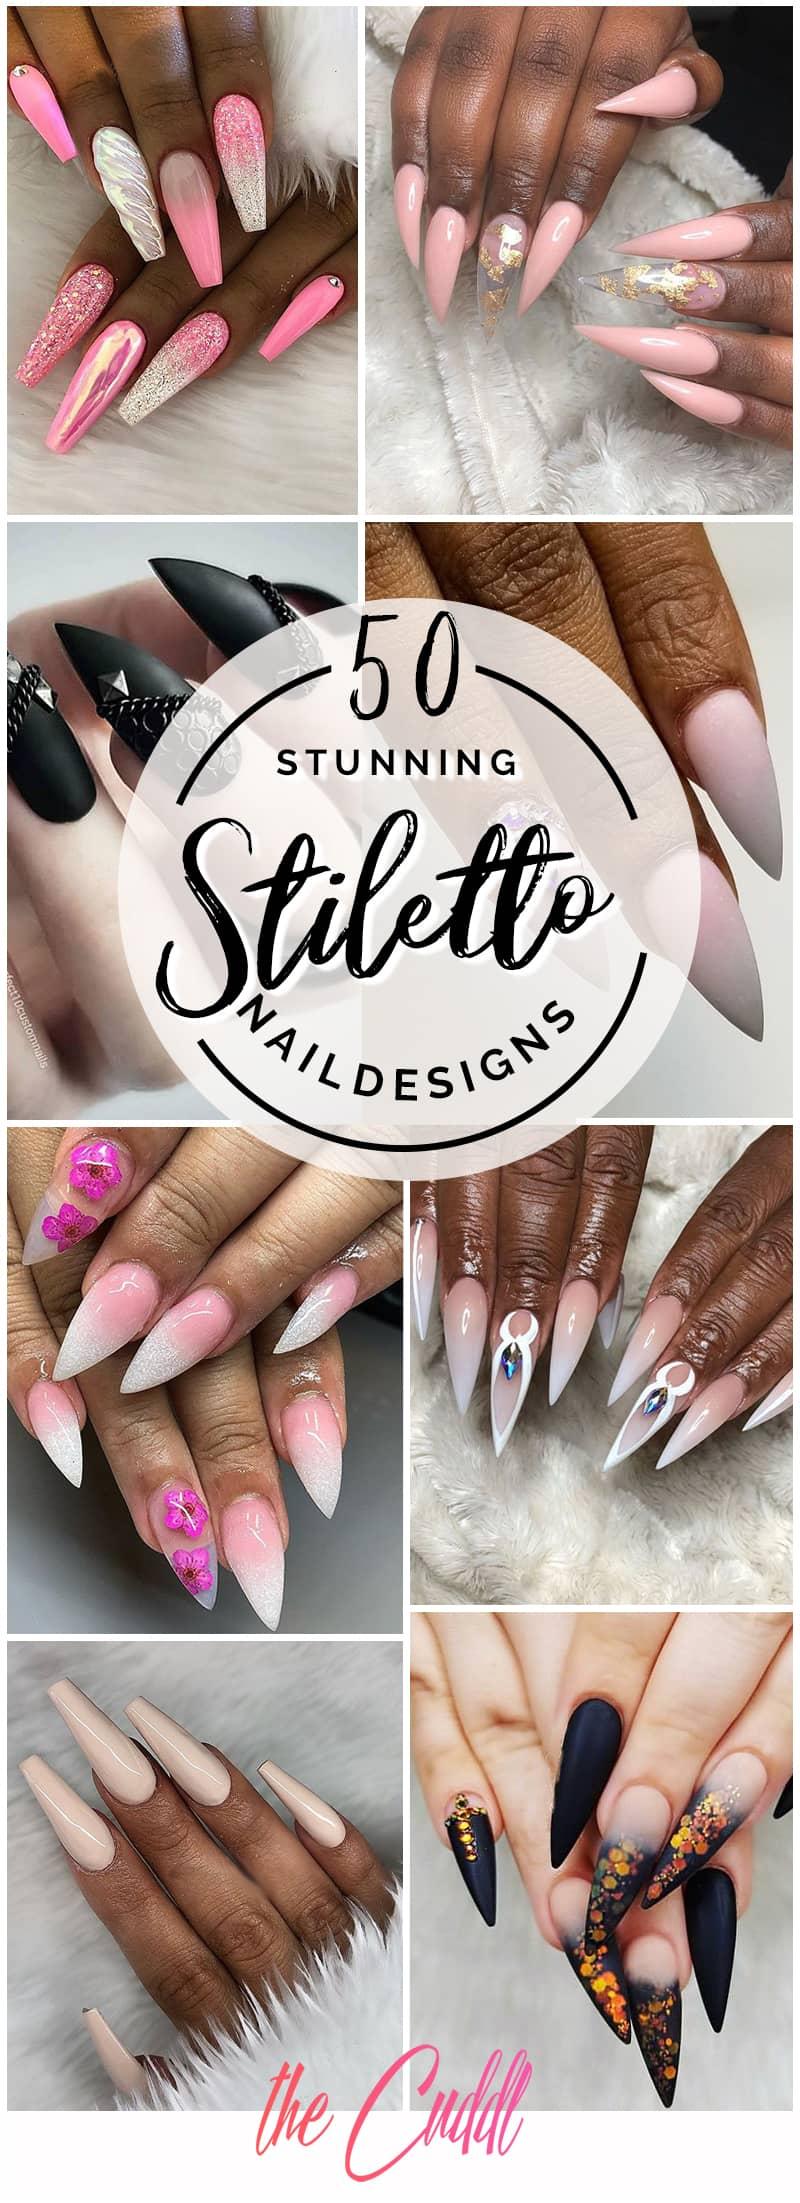 50 Stunning Stiletto Nail Ideas that Will Rock Your World